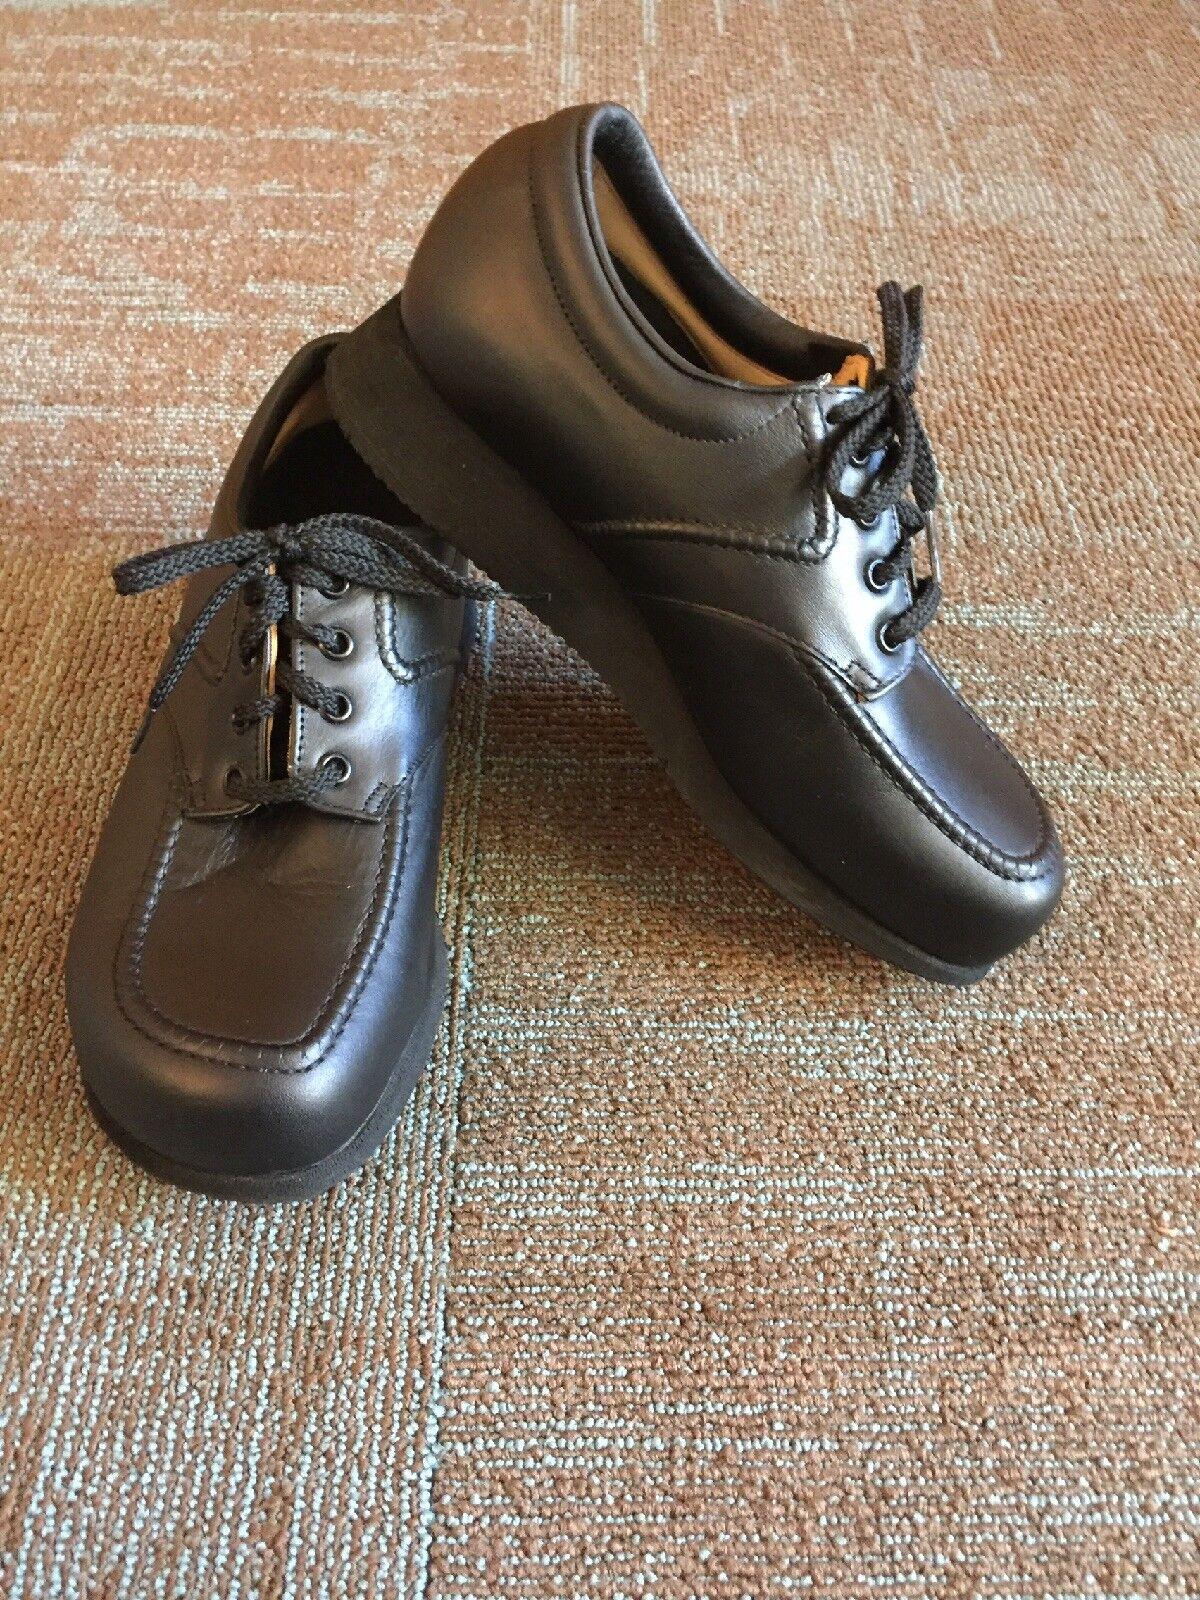 Women's PW Minor Contessa Extra Depth Orthopedic Diabetic shoes,size 8.5 WW 2E